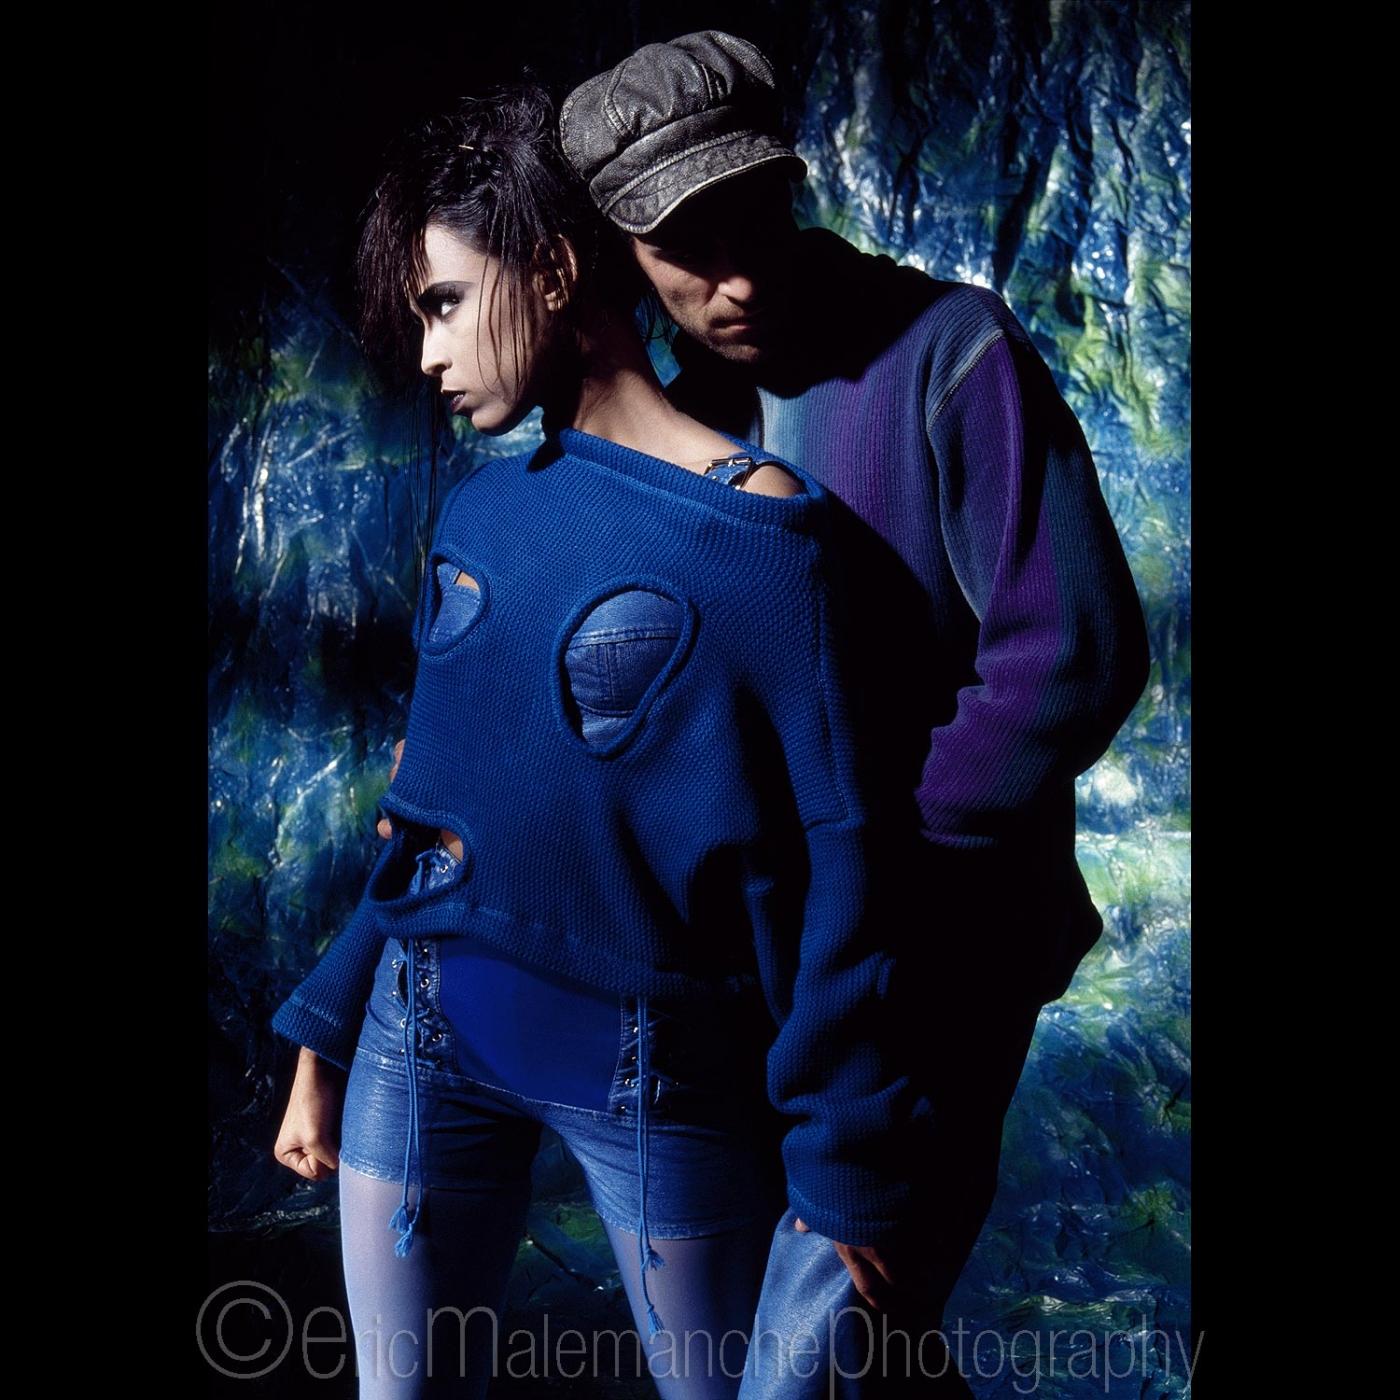 https://www.ericmalemanche.com/imagess/topics/fashion-90-s/liste/Fashion-16.jpg